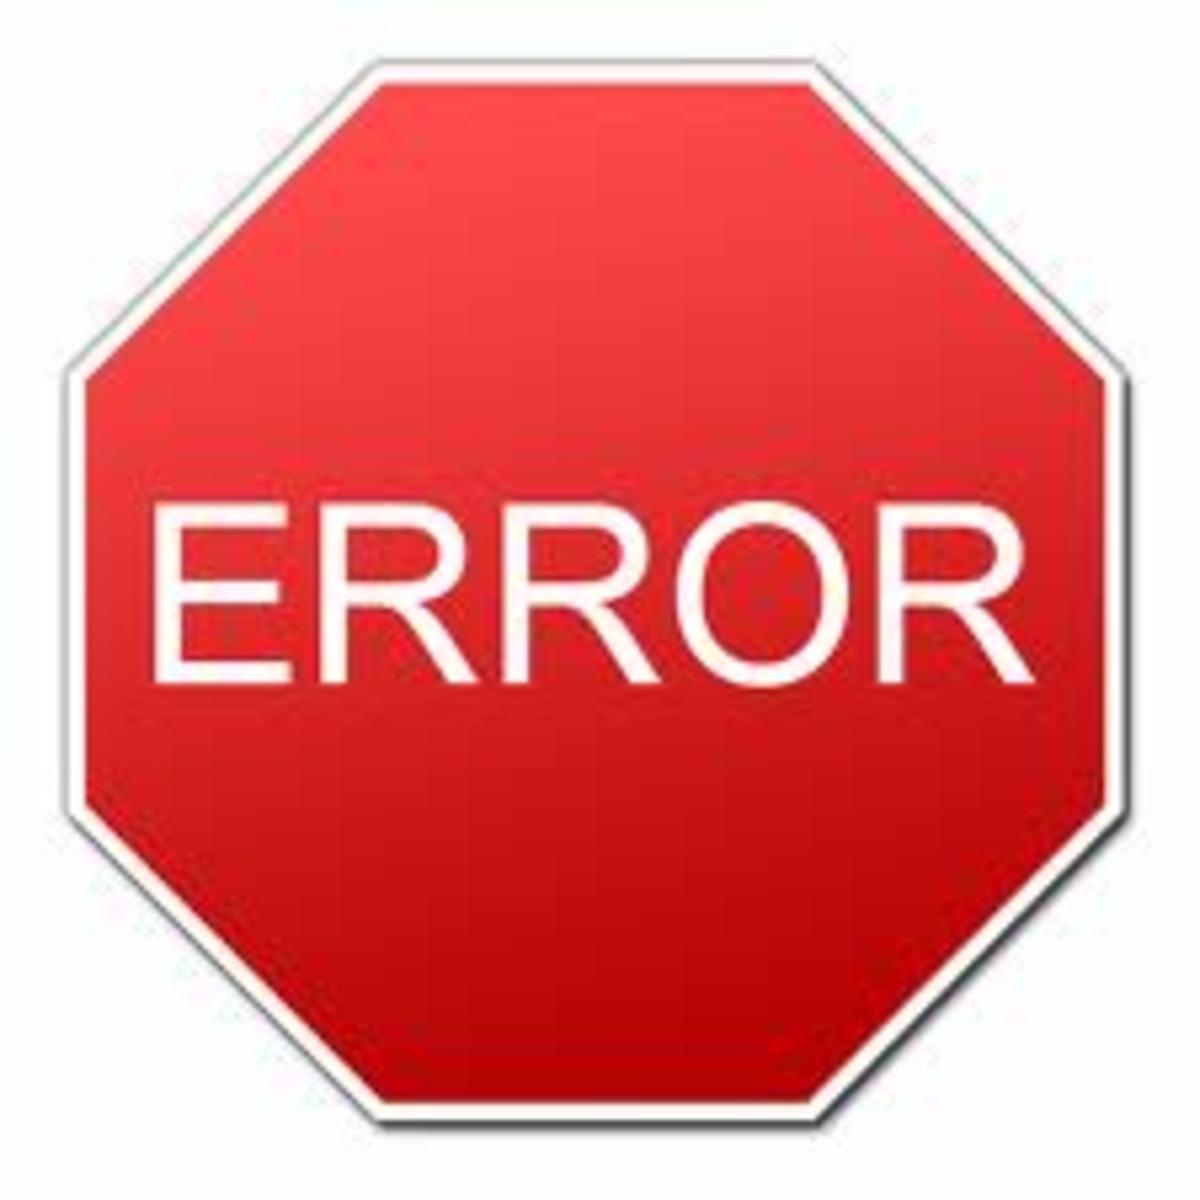 Types of programming errors